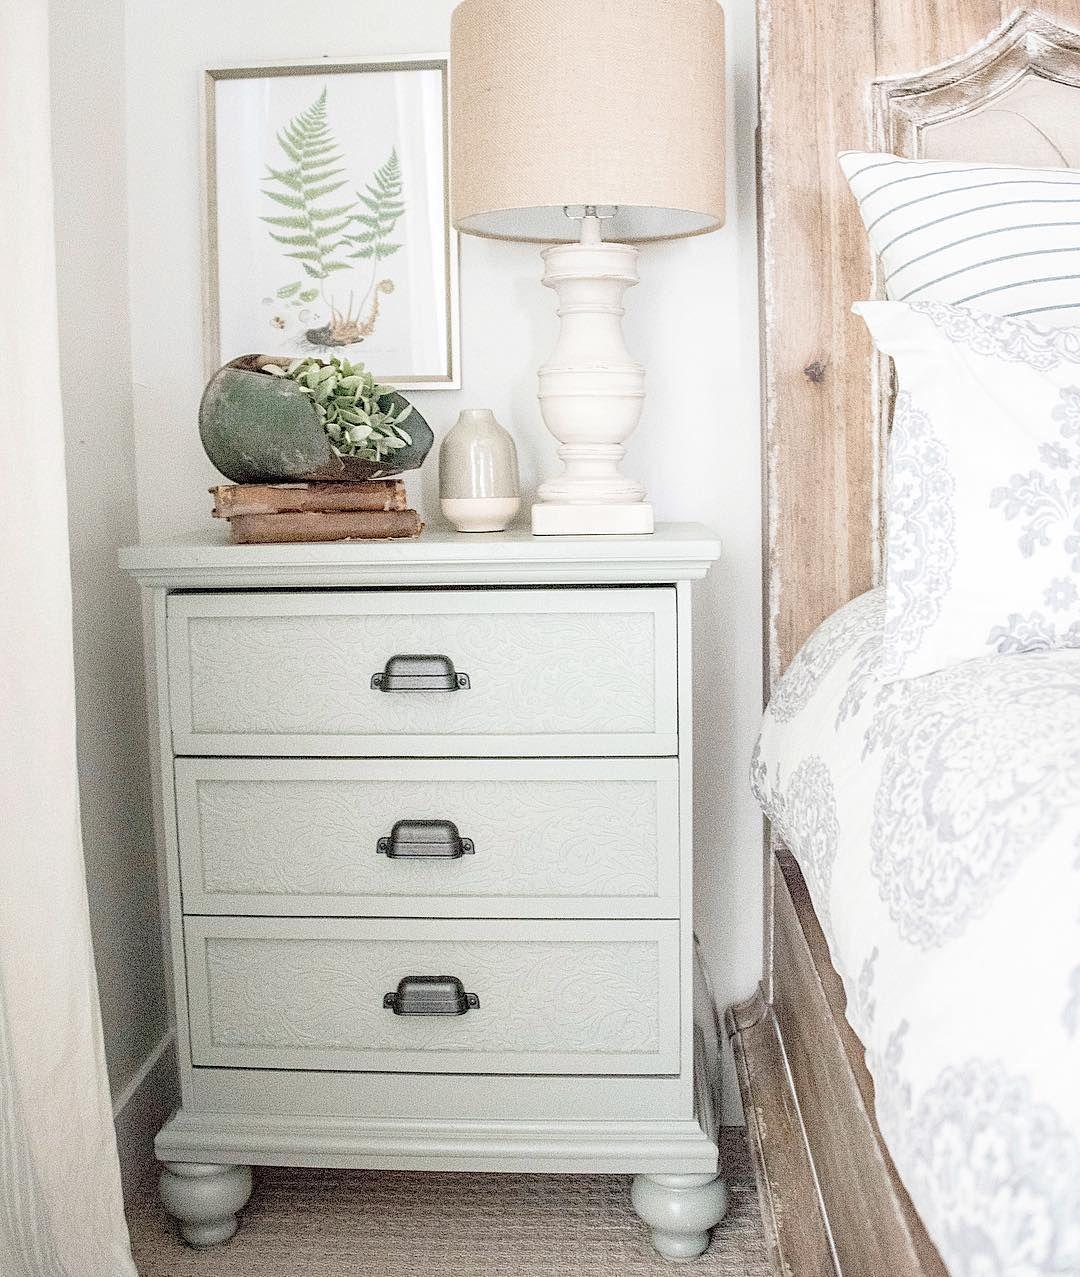 wallpaper homedepot. drawer pulls target.. paint